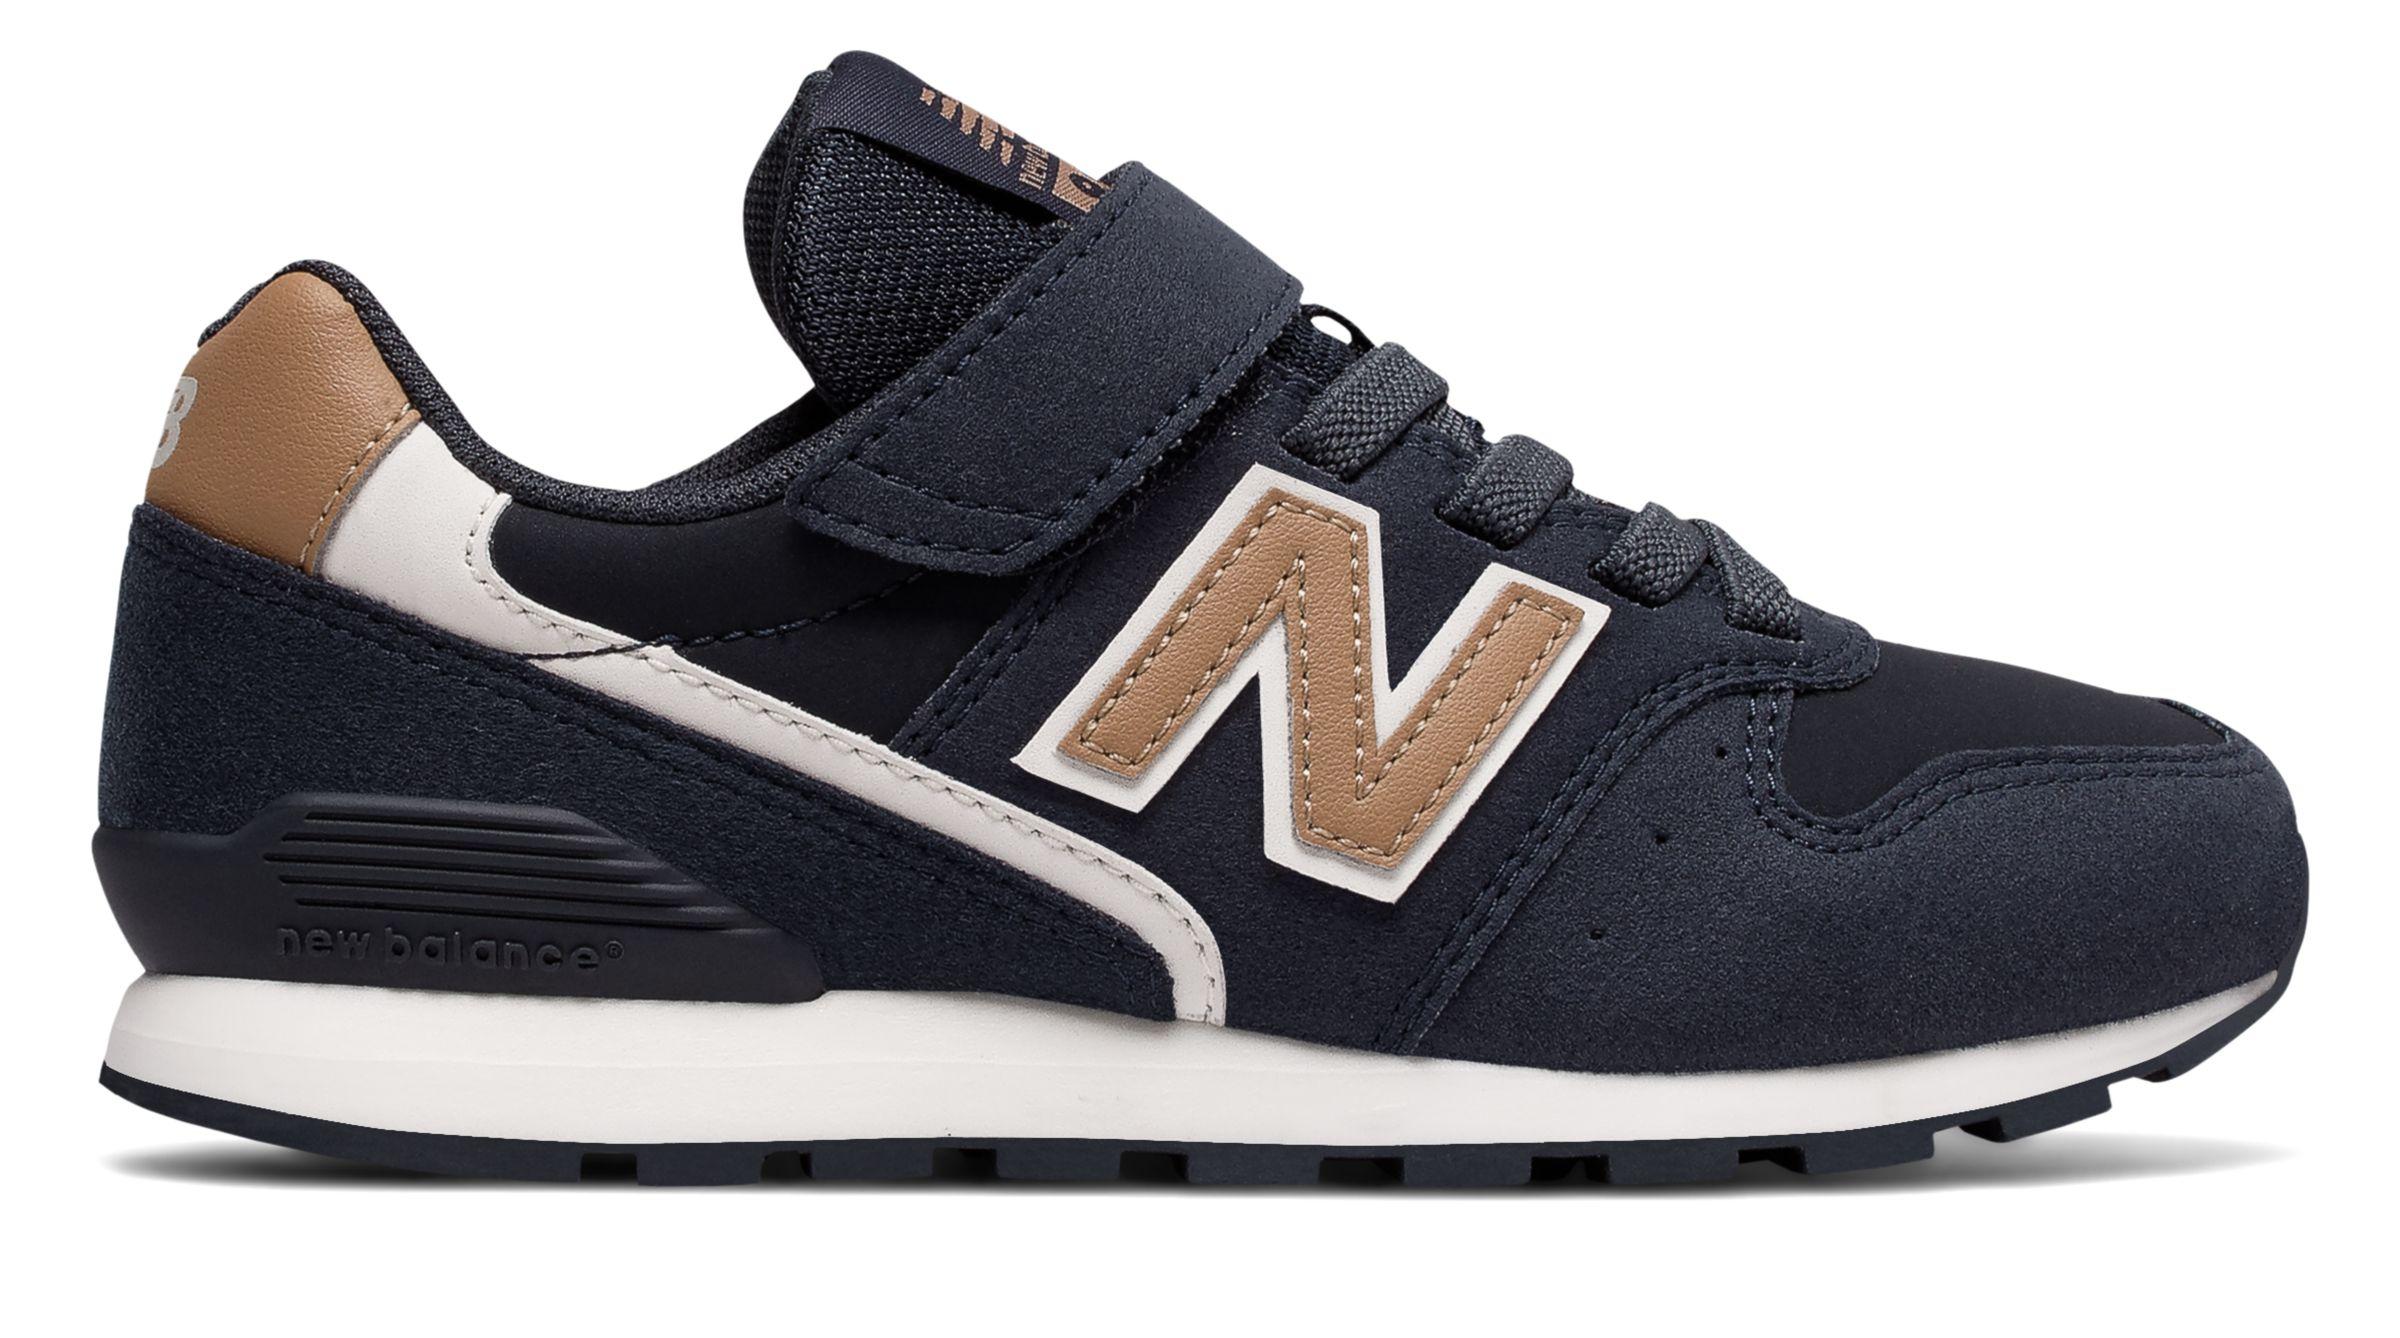 NB New Balance 996v2, Navy with Beige